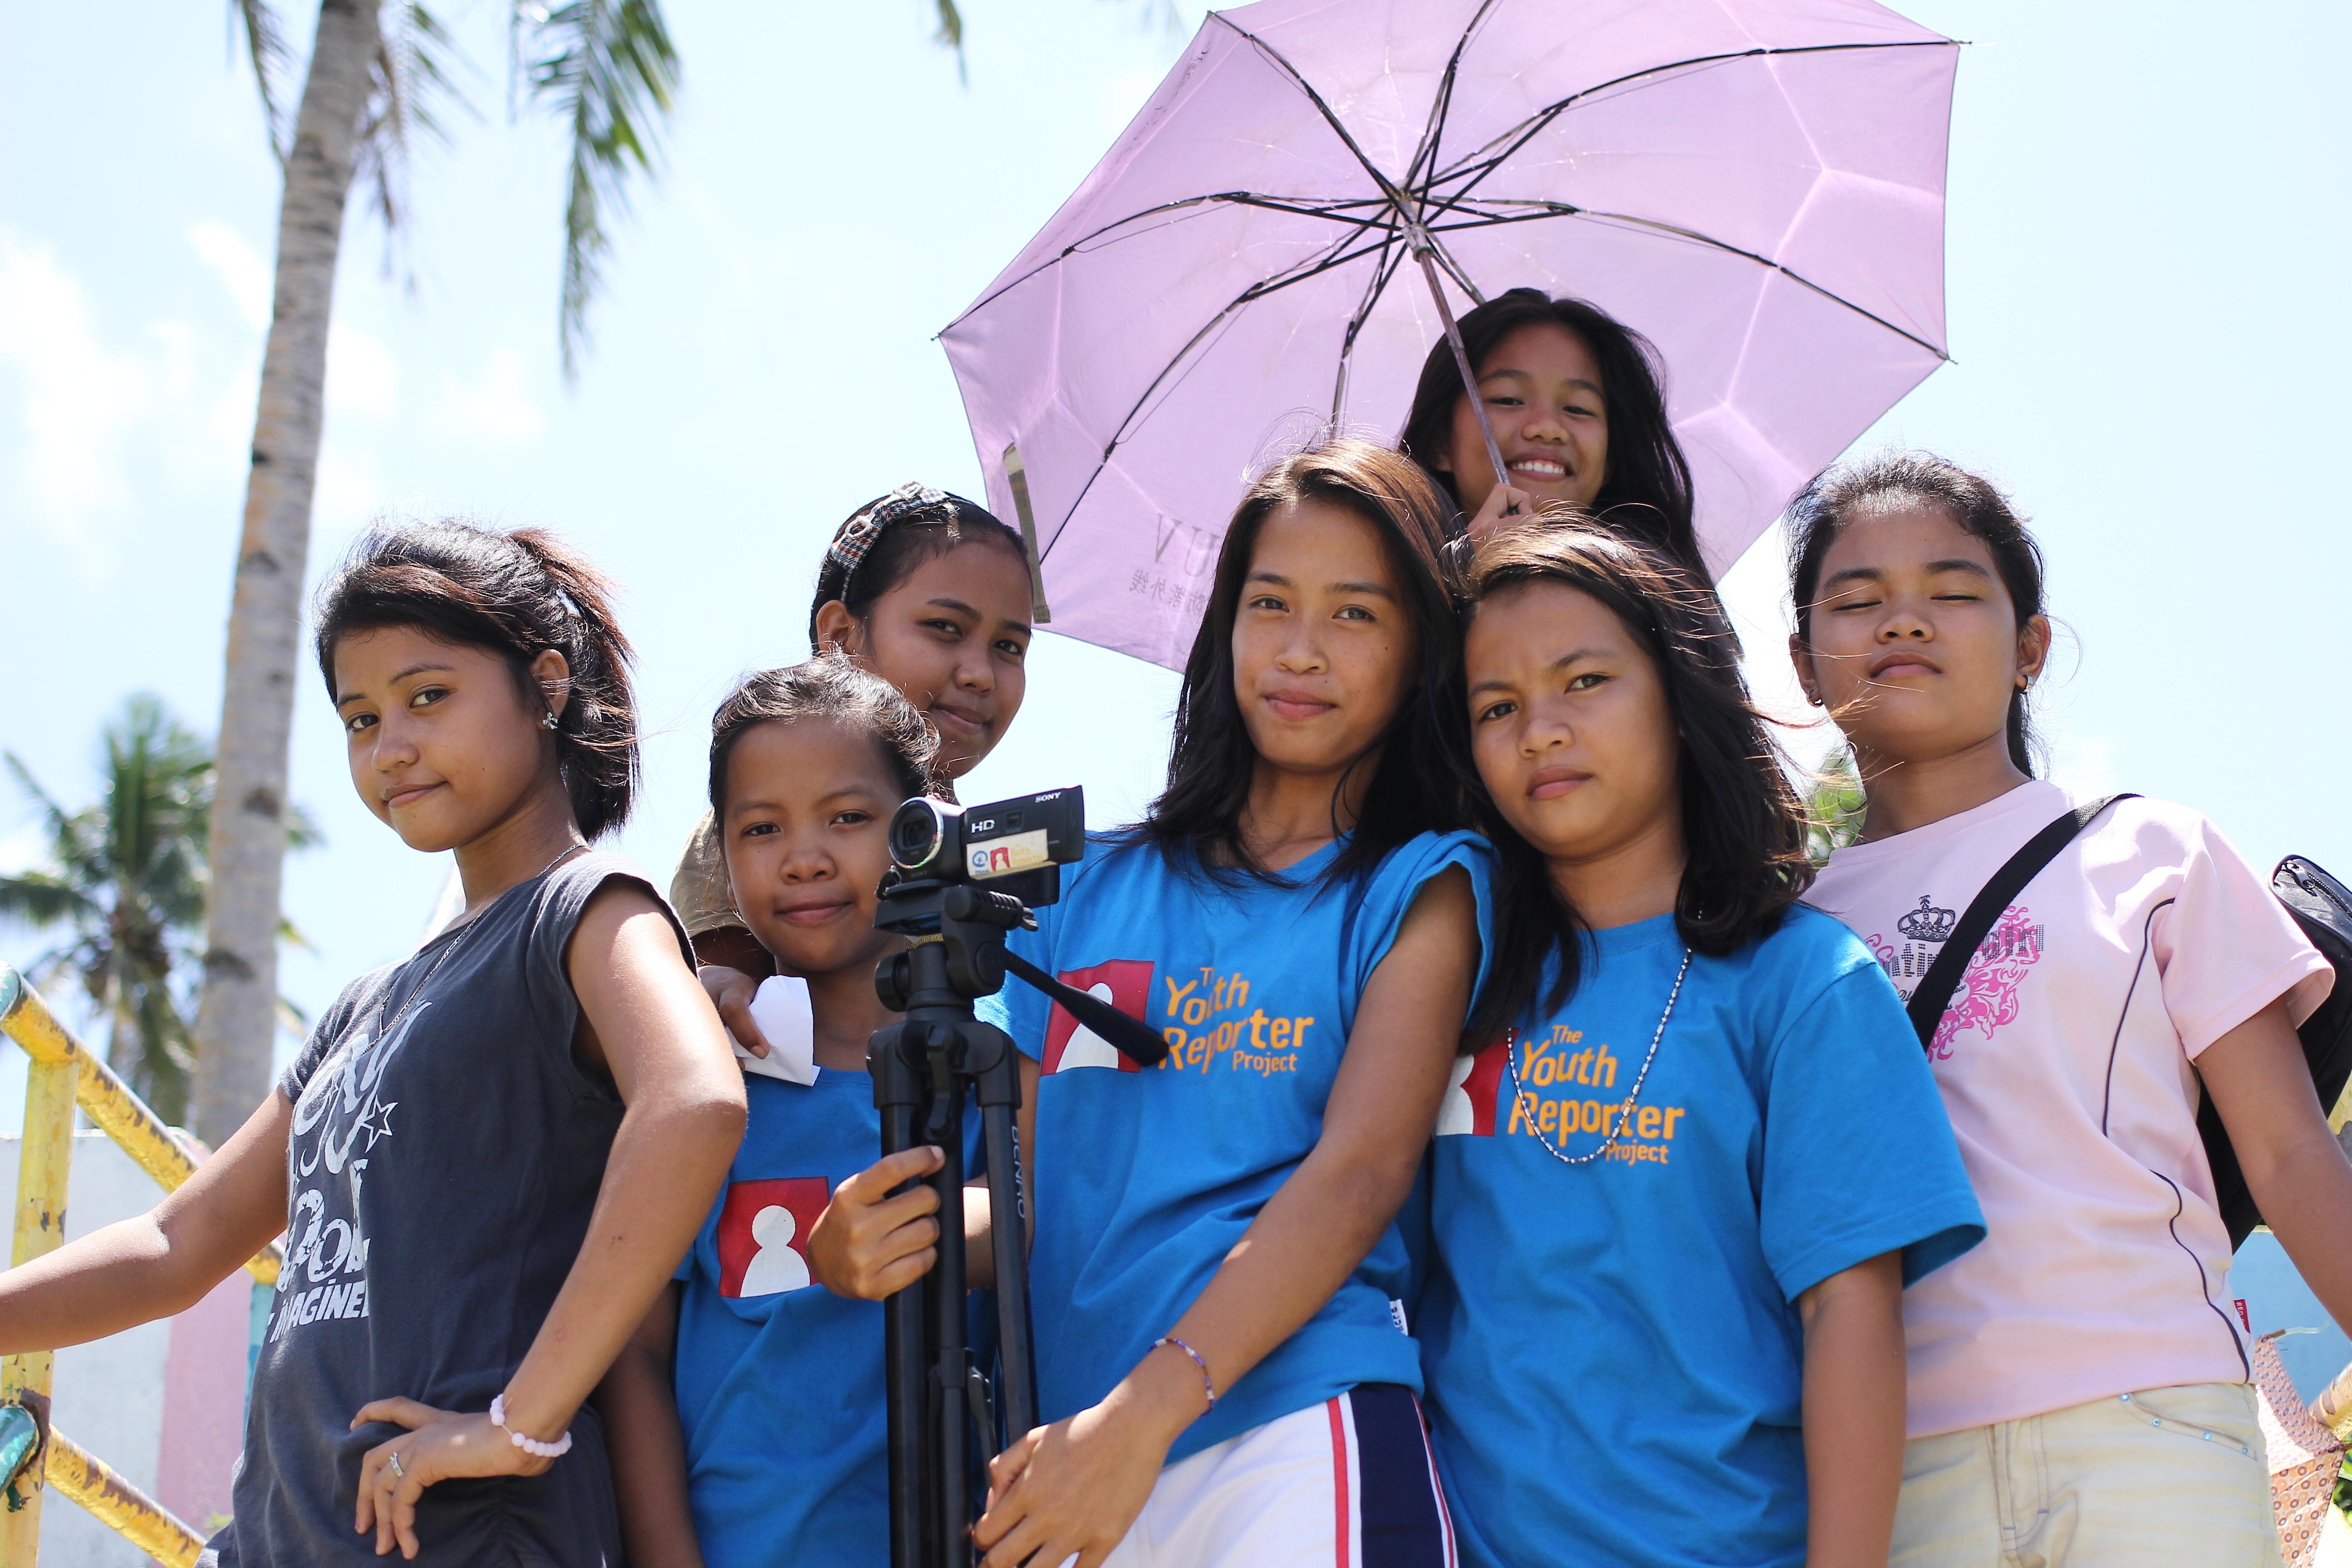 Phillipines clipart child group work #9